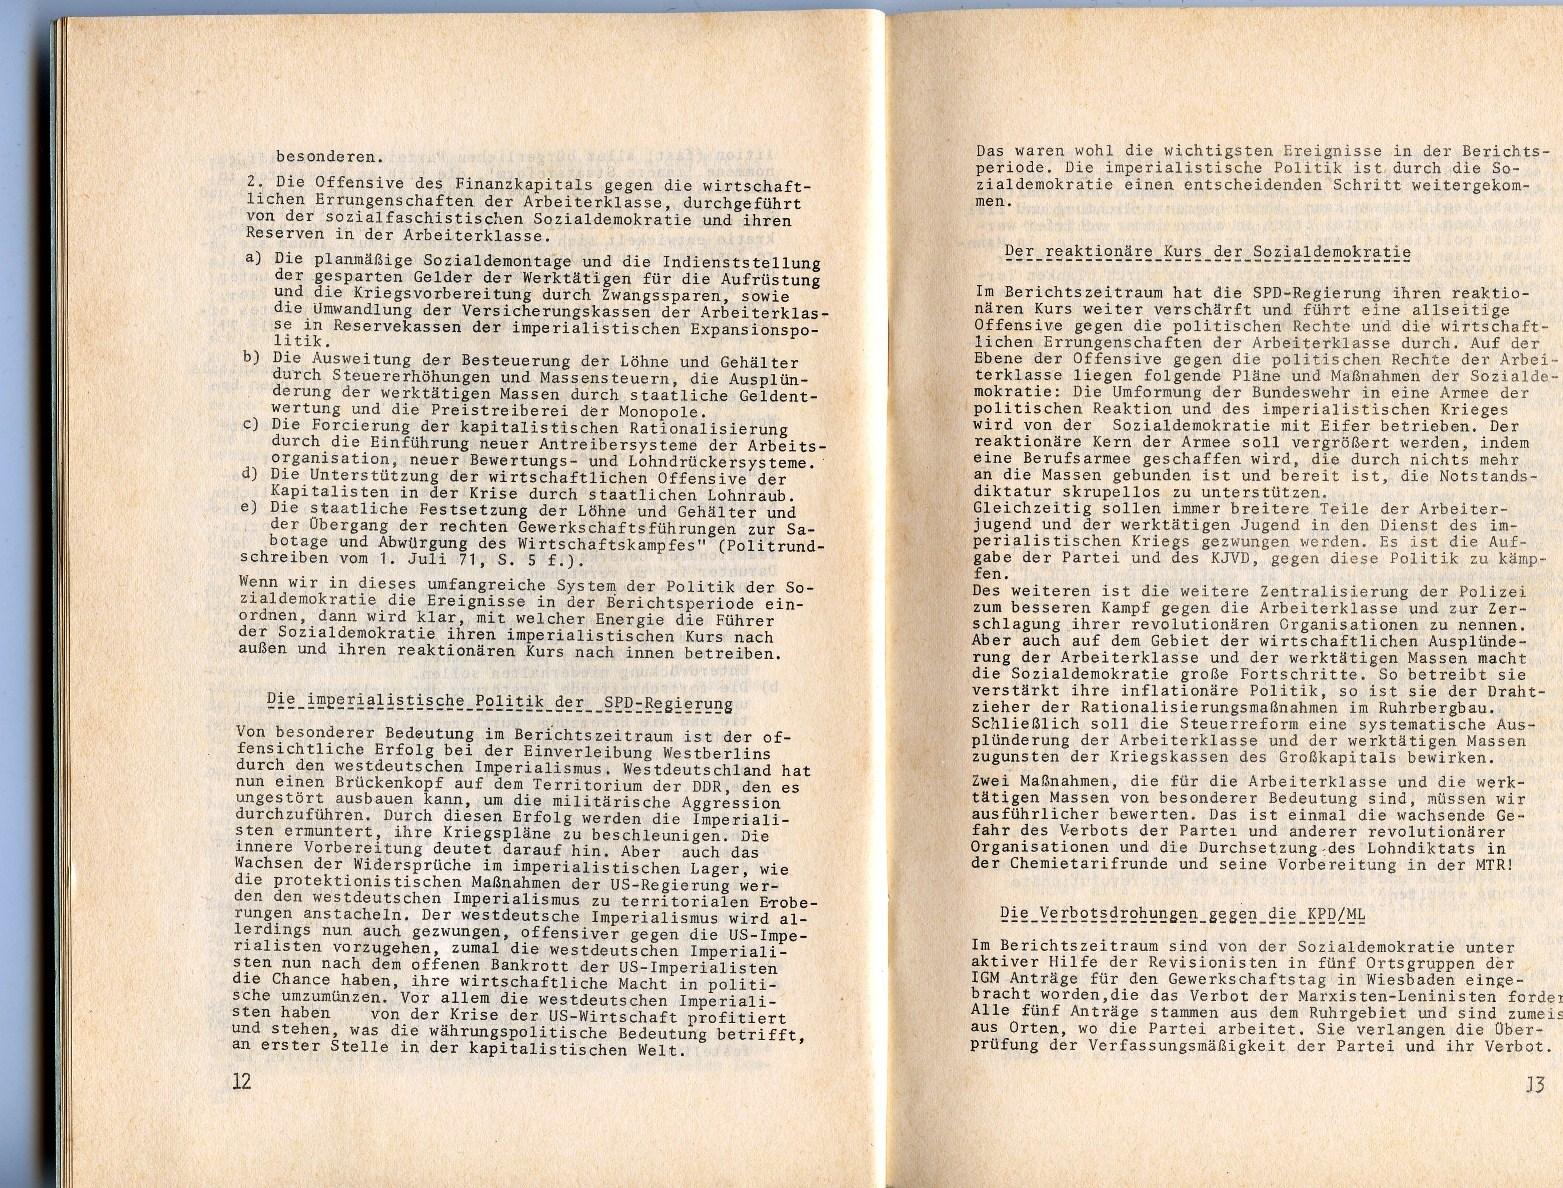 ZB_Parteiarbeiter_1971_07_08